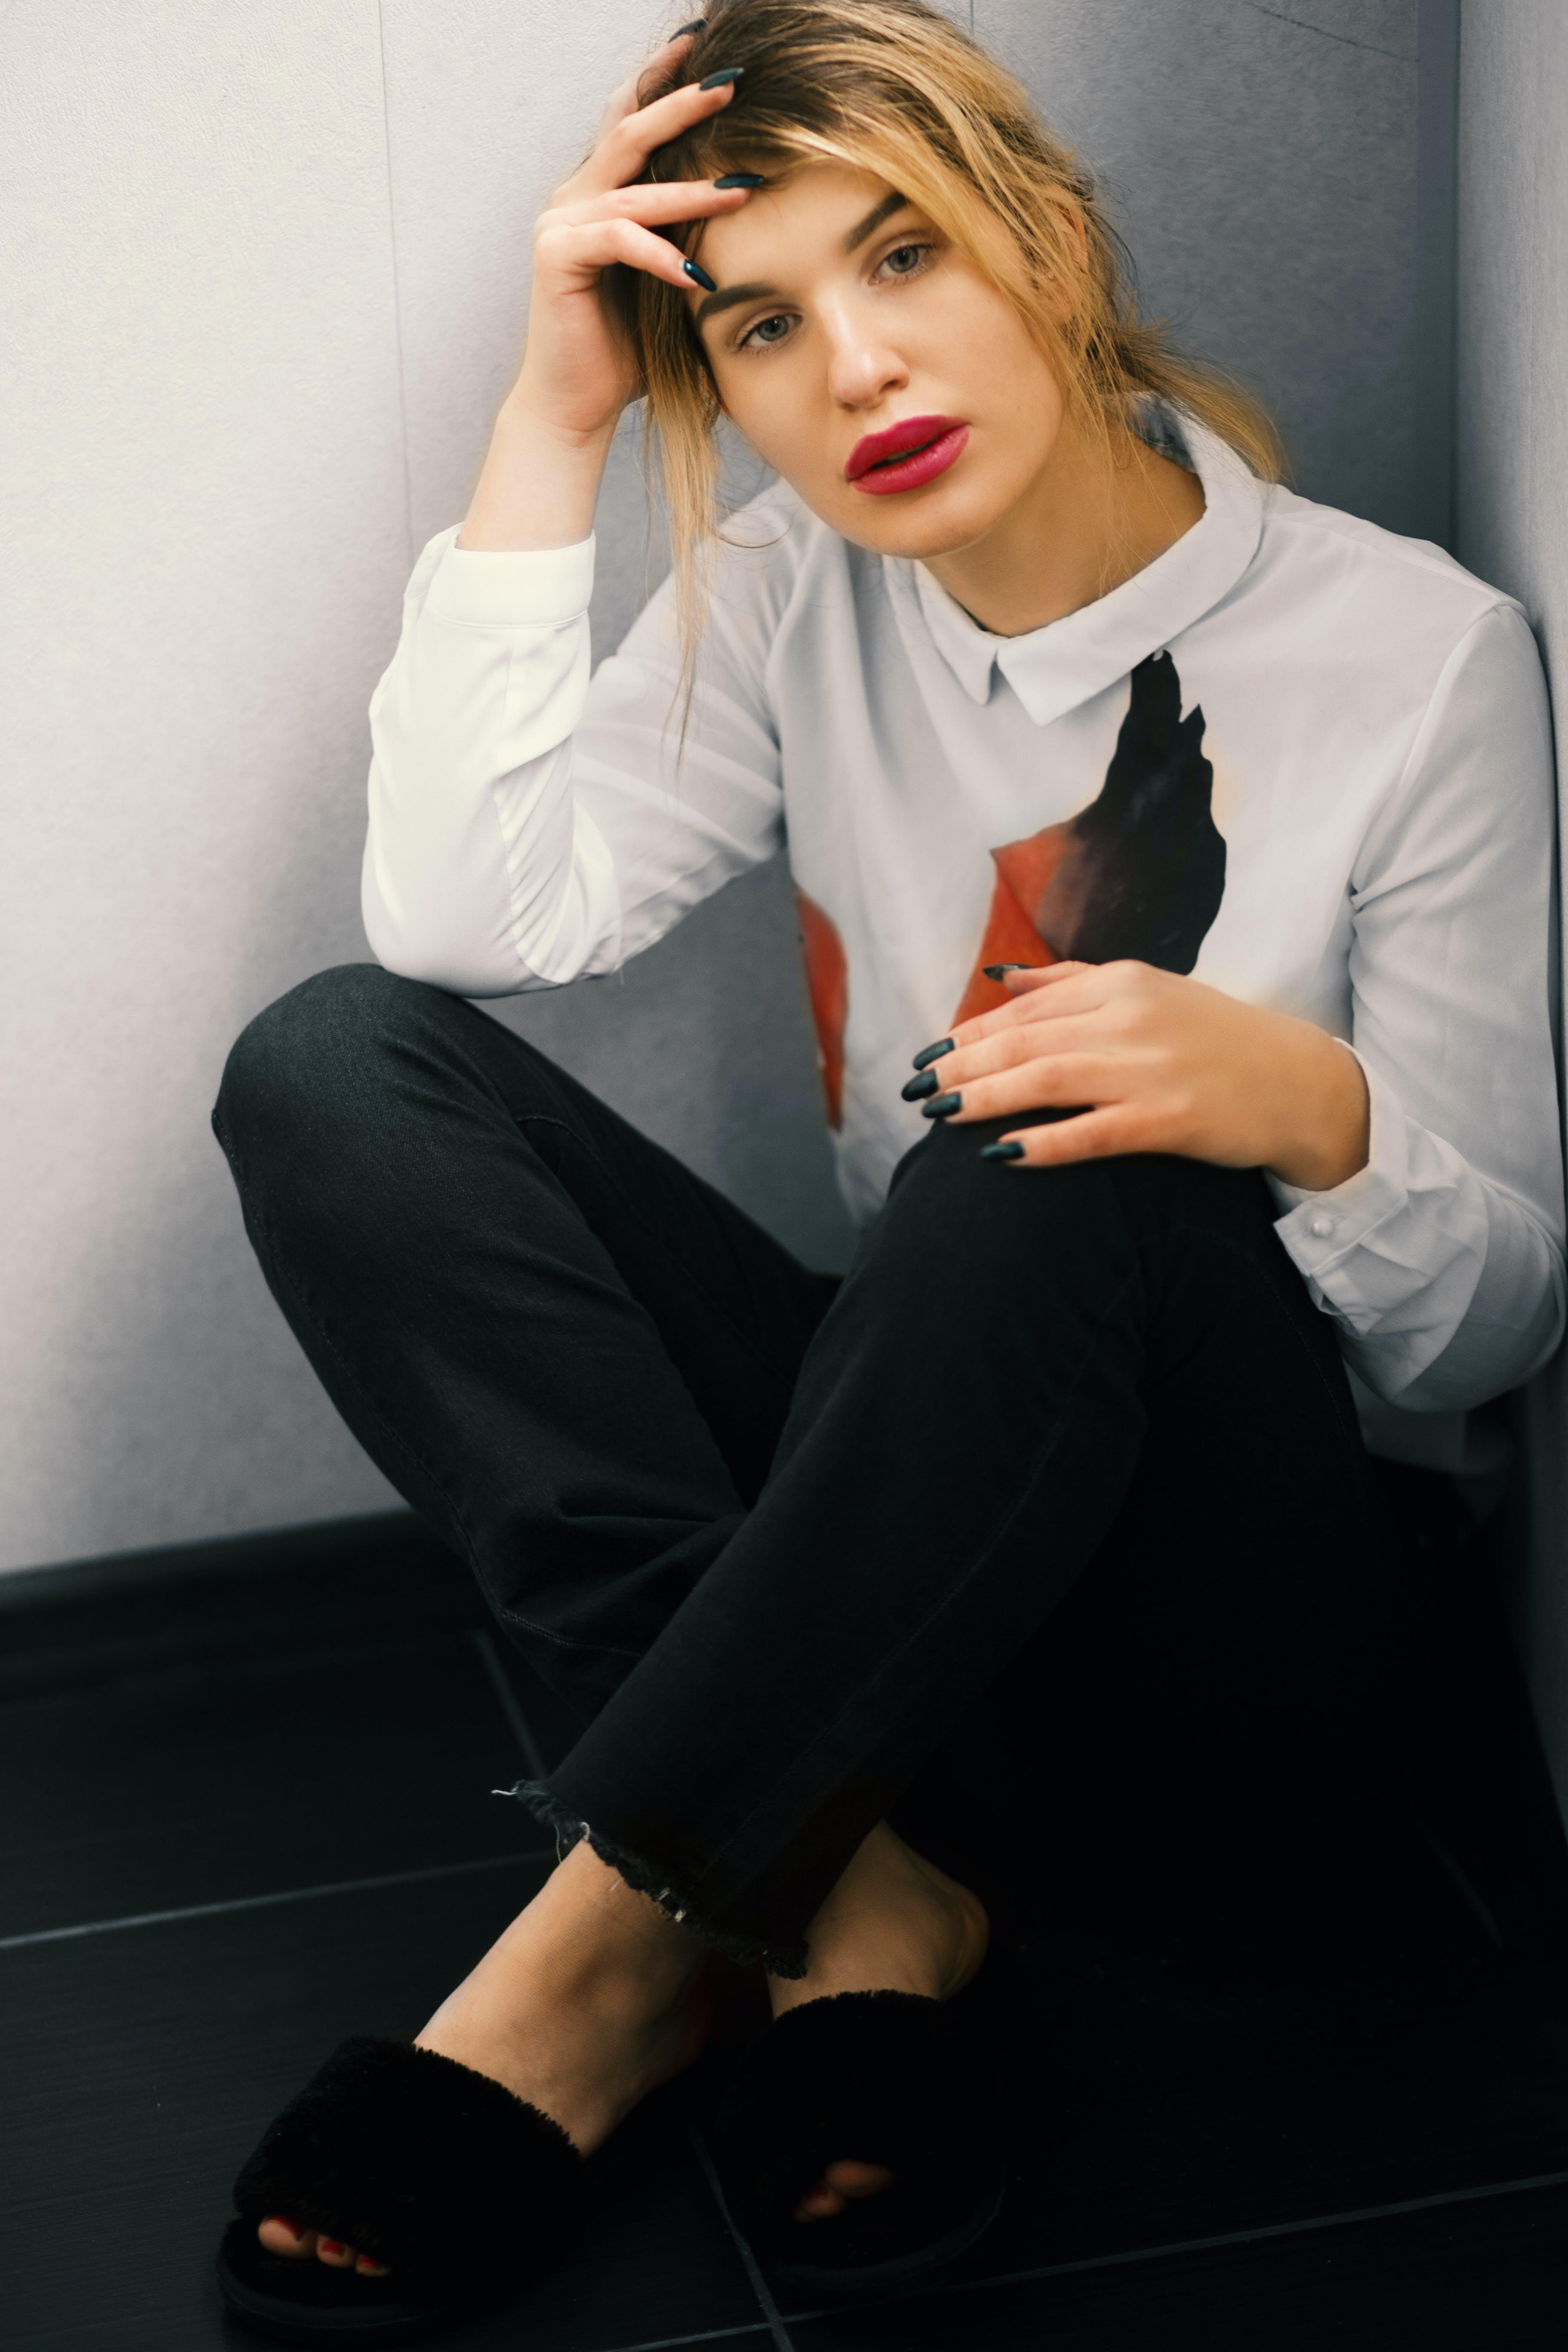 Women Wearing Black Dress Pants and White Long-sleeved Dress Shirt Sitting on the Corner